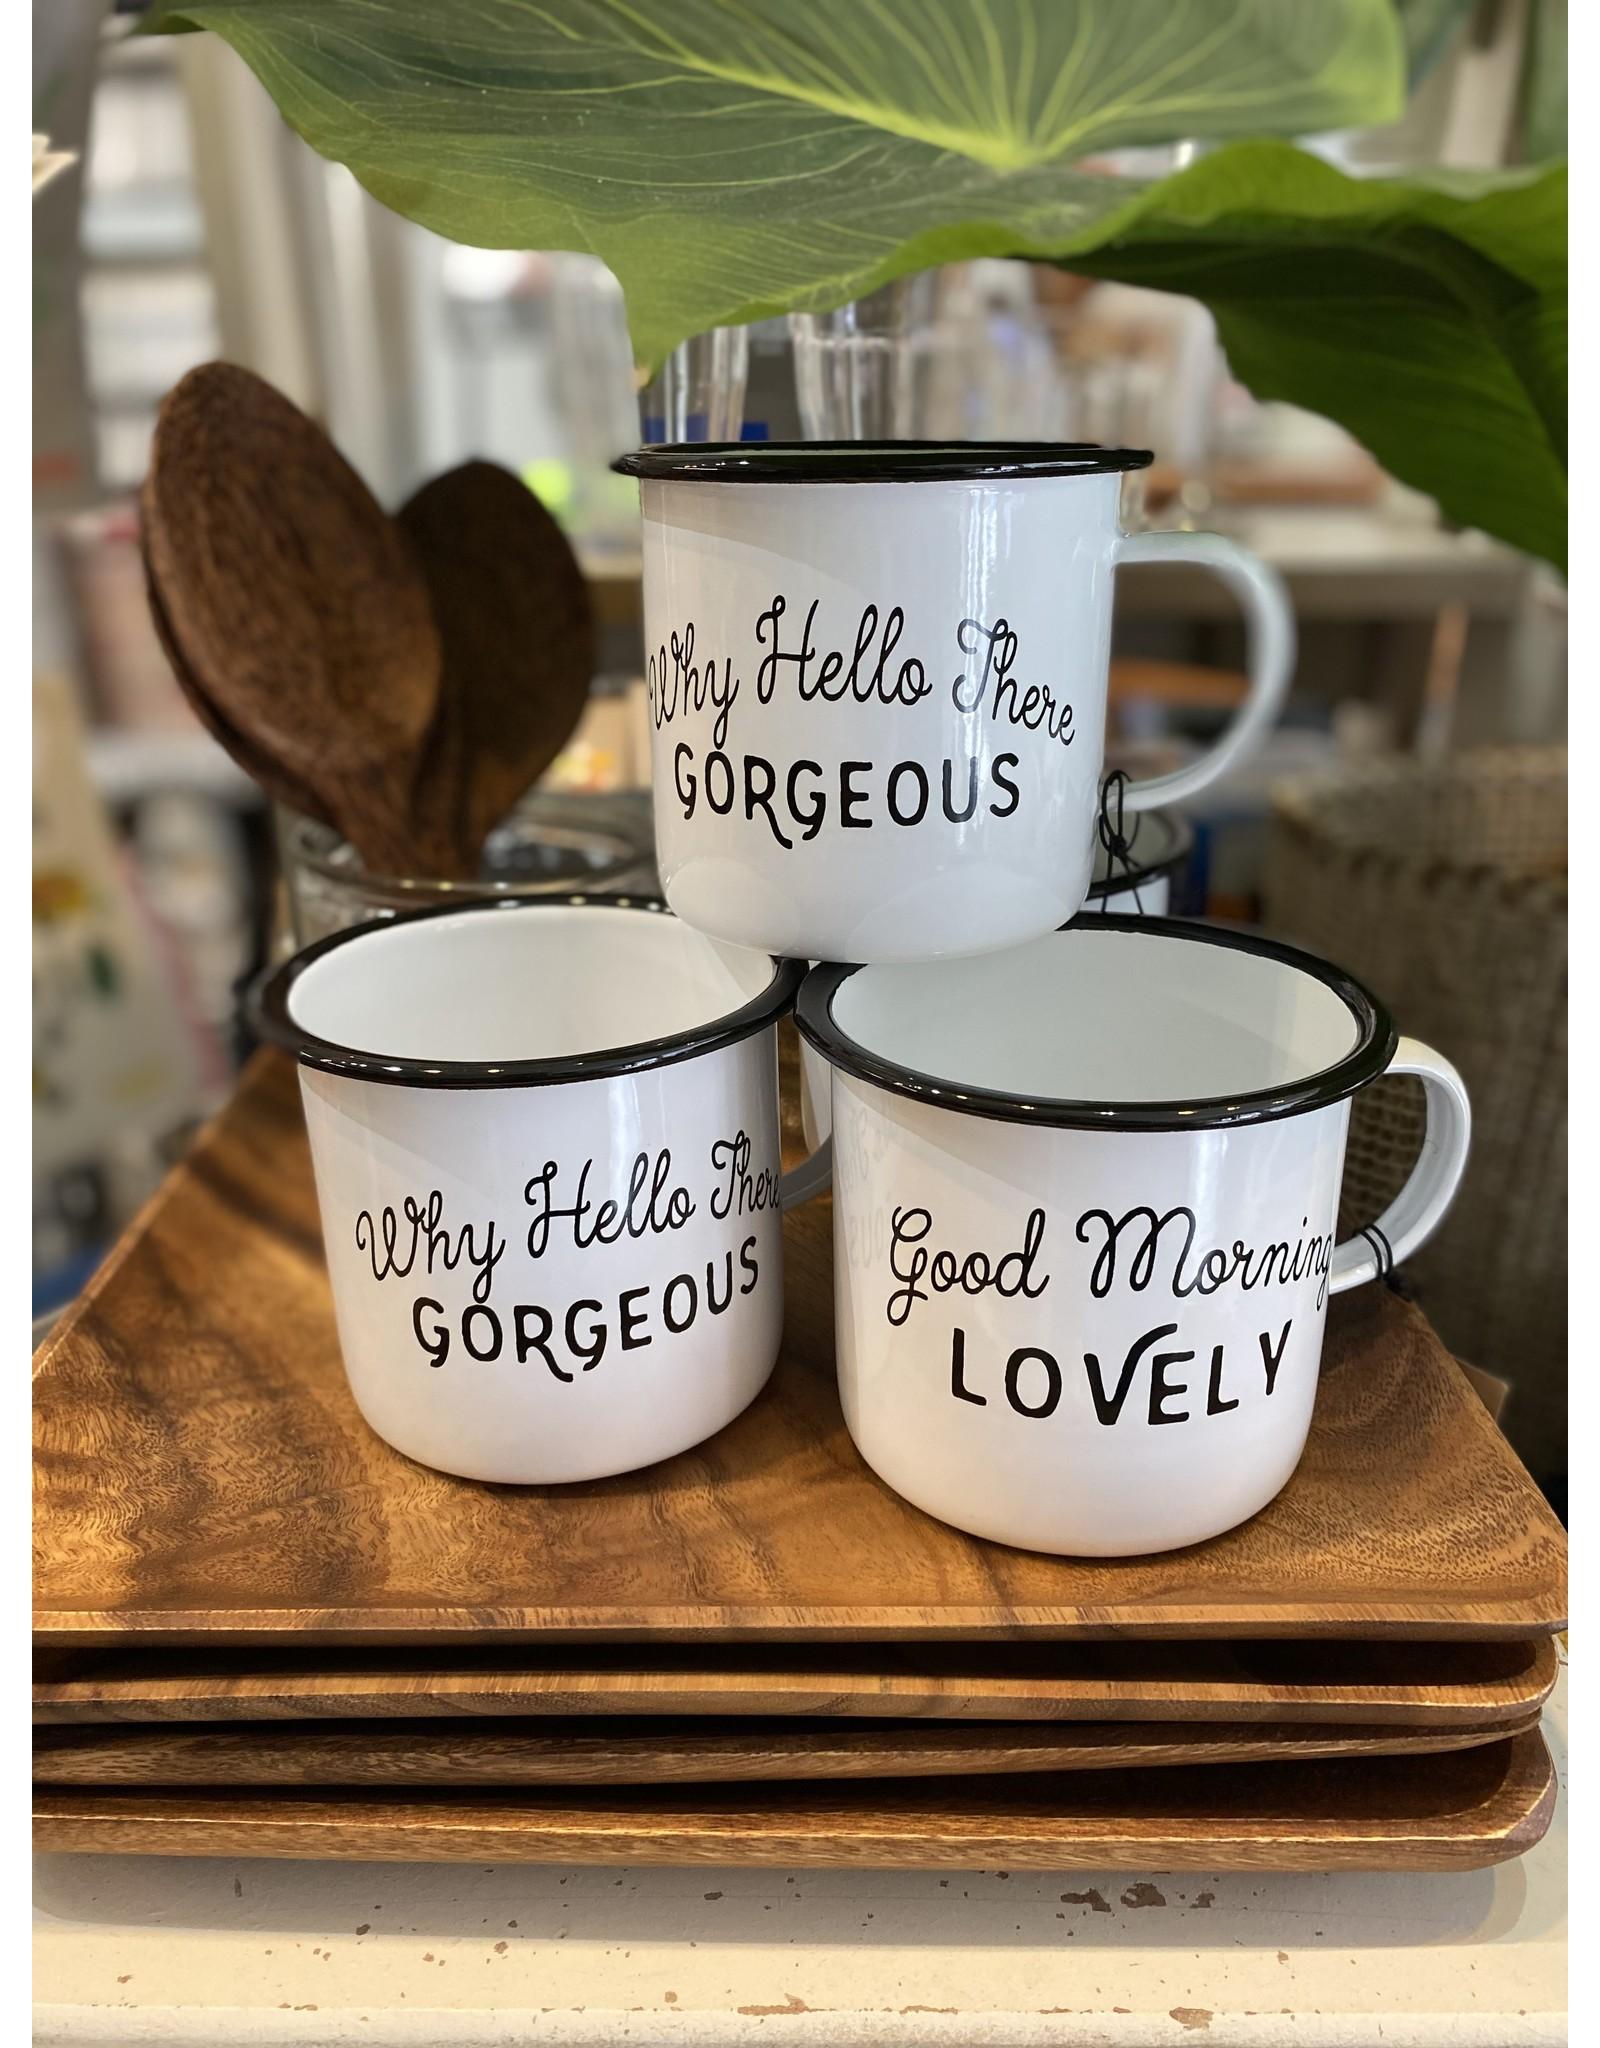 Enamel Mug with Saying